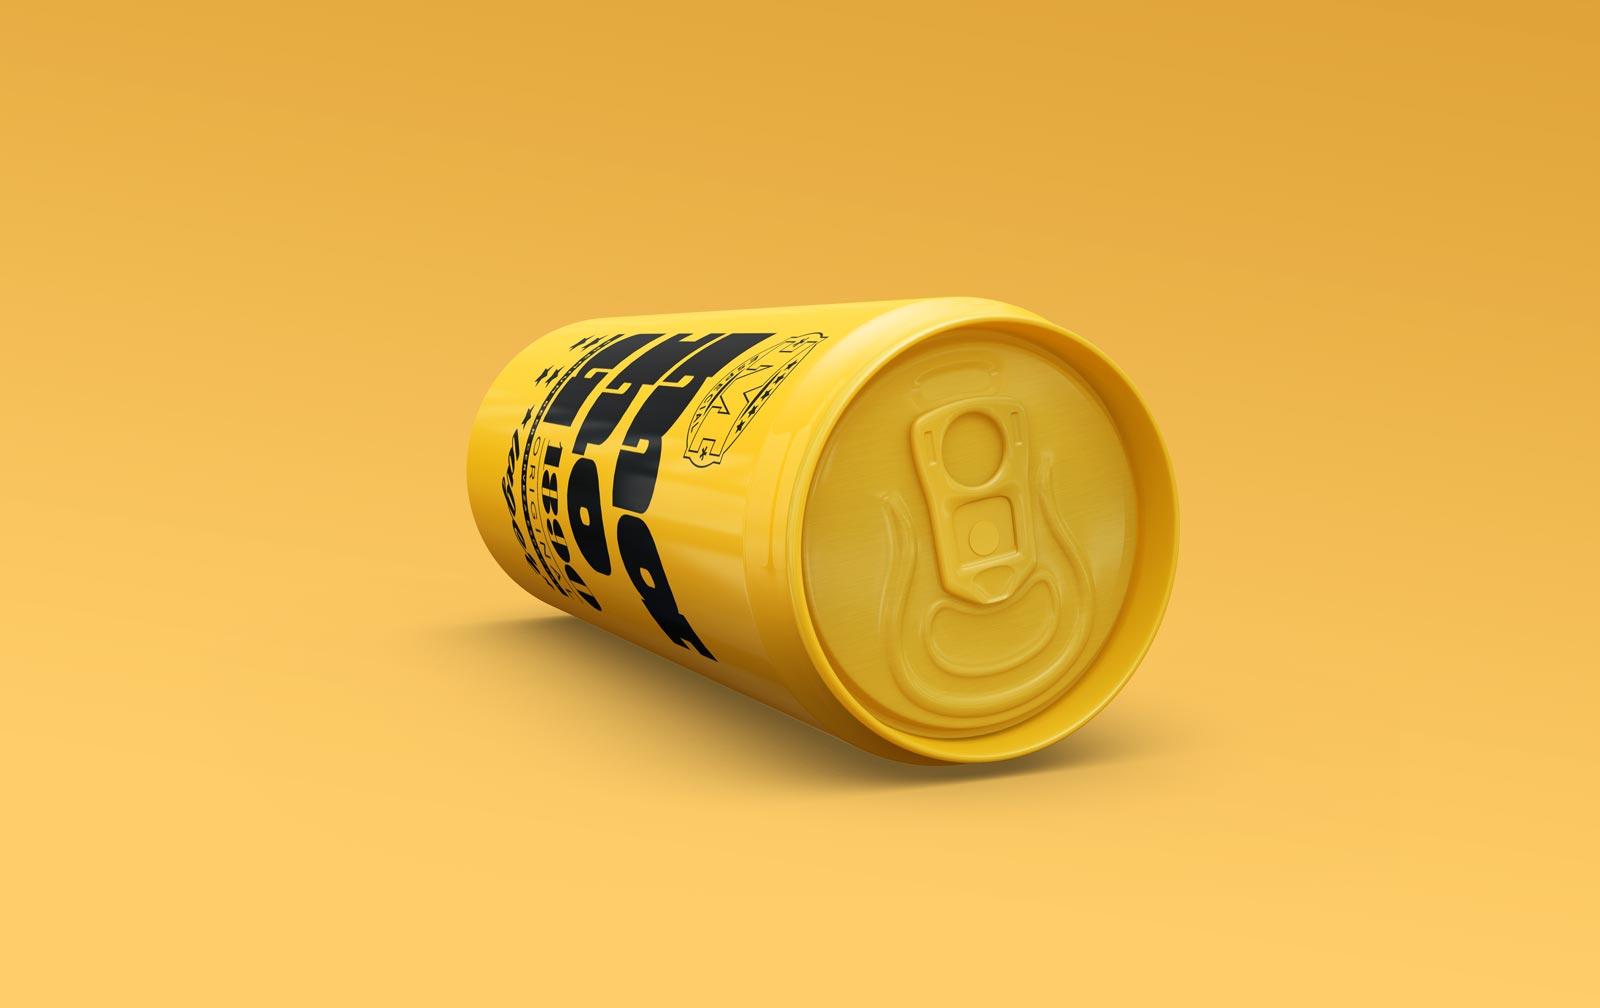 Mahou-Packaging-09